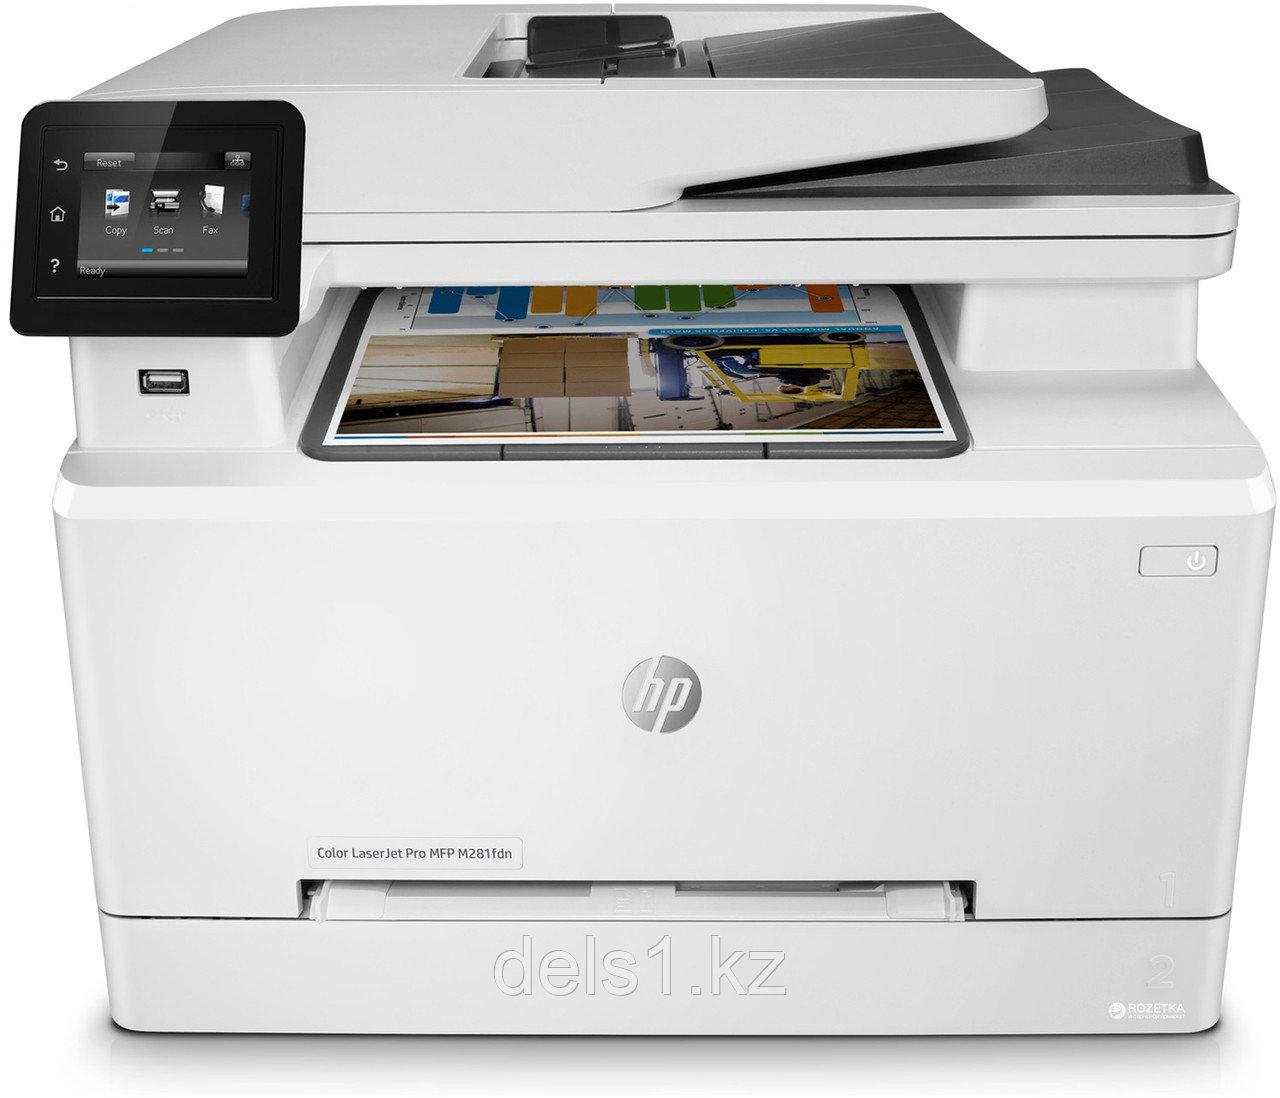 Цветное МФУ HP Color LaserJet Pro M281fdw